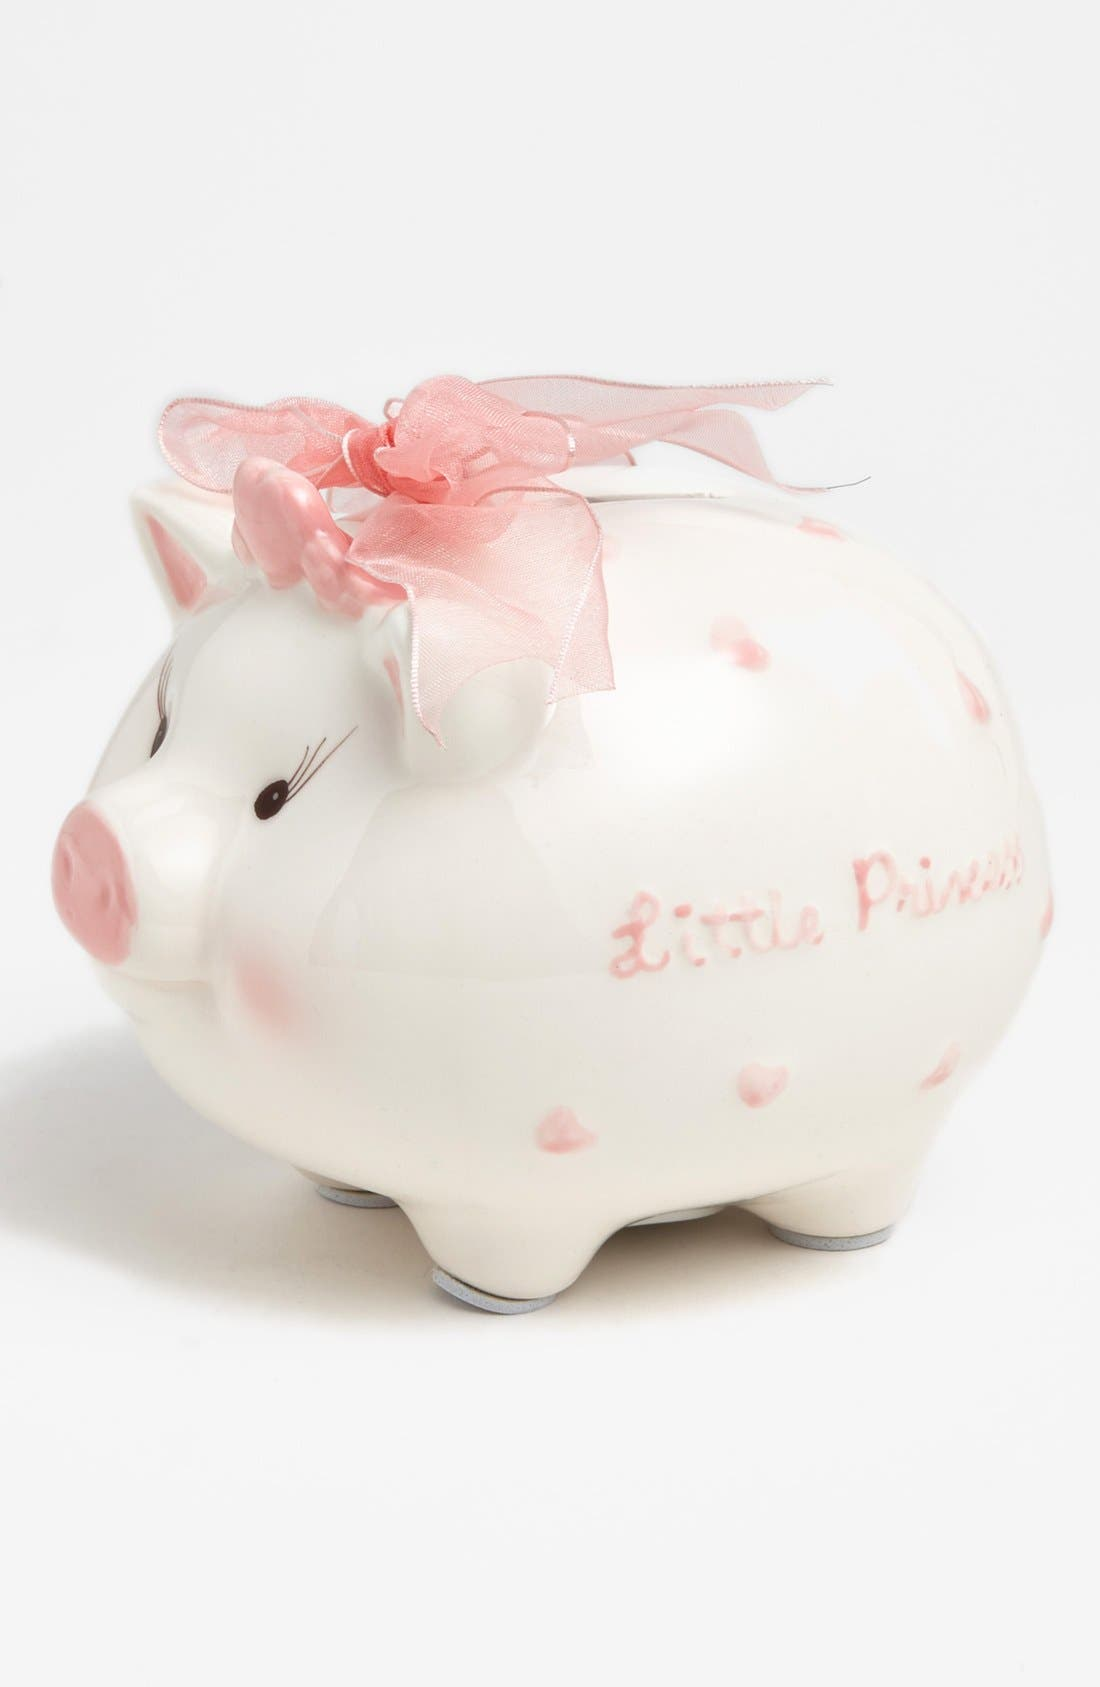 Mud Pie 'Little Princess' Bank